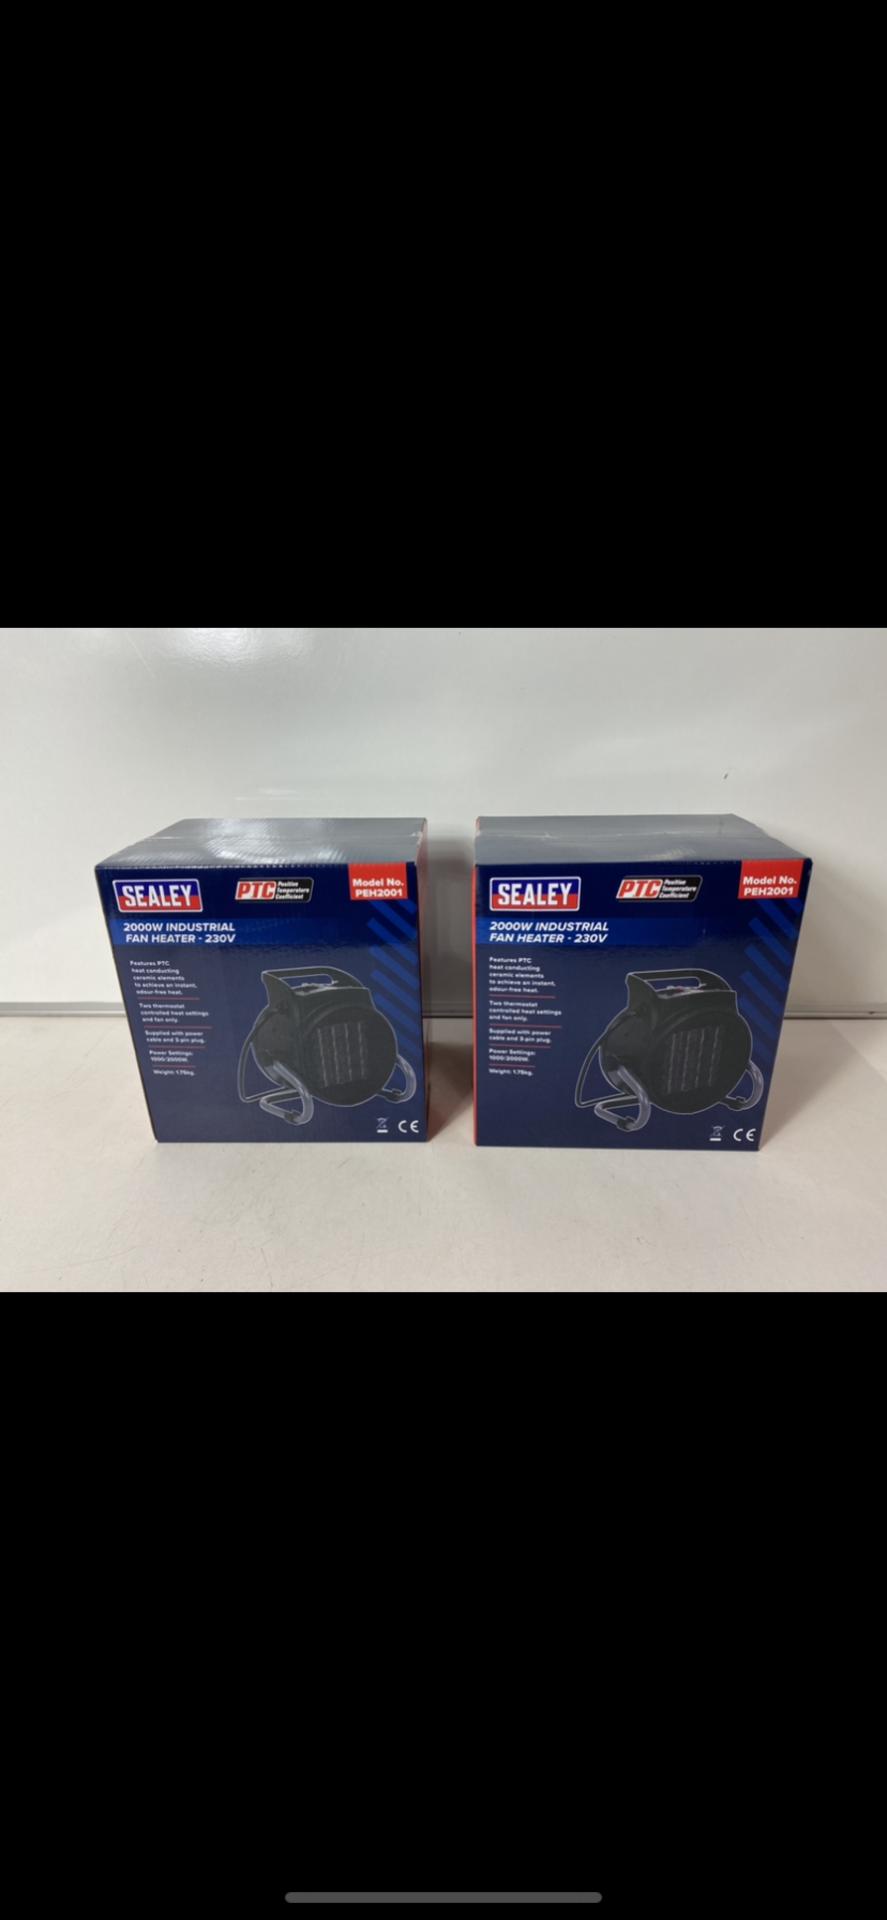 Lot 16 - Pair Of Sealey Industrial PTC Fan Heater 230V PEH